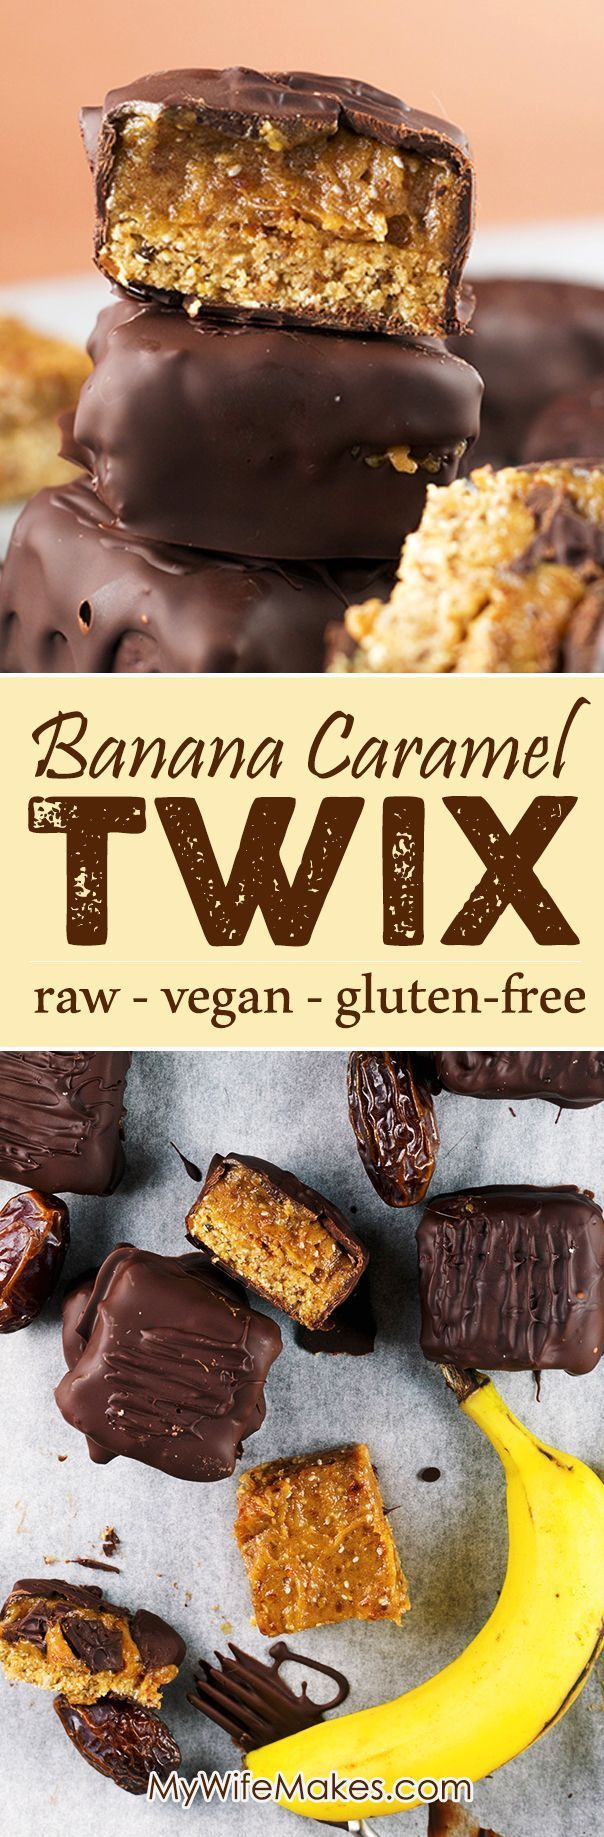 raw veganism benefits at http://www.rawveganismgazette.com